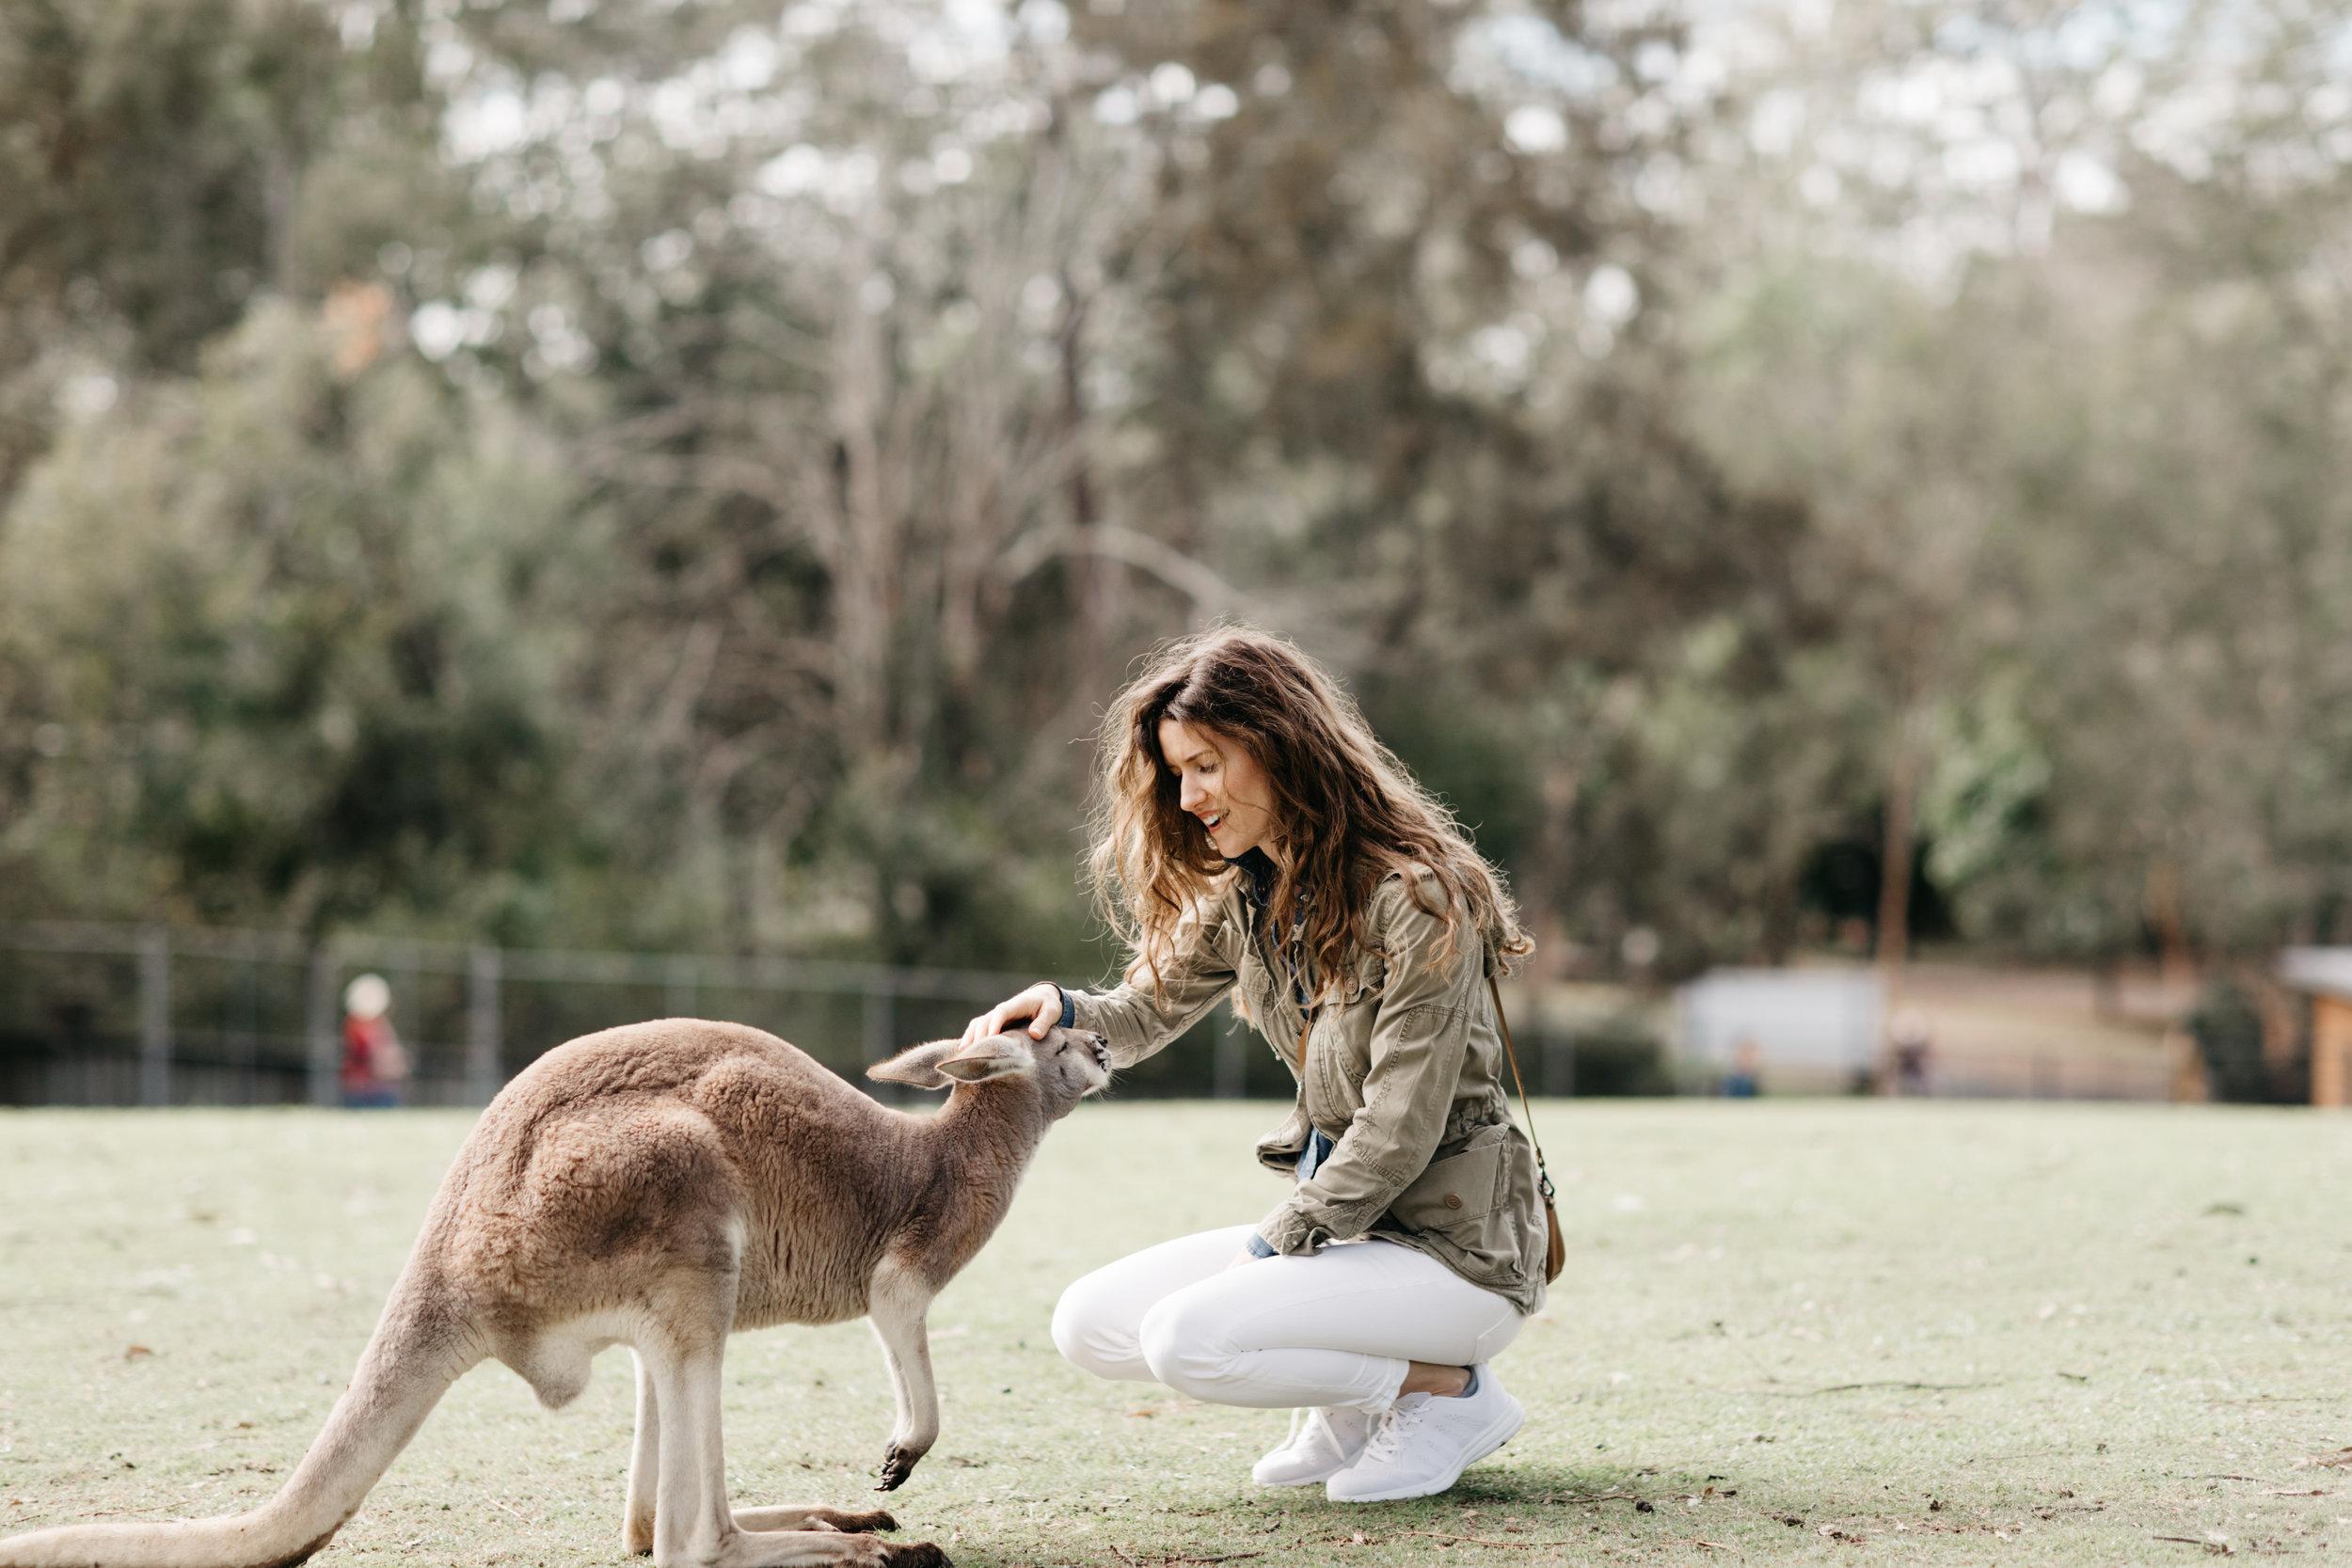 brisbane_lone_pine_kangaroo_photo_by_samantha_look.jpg